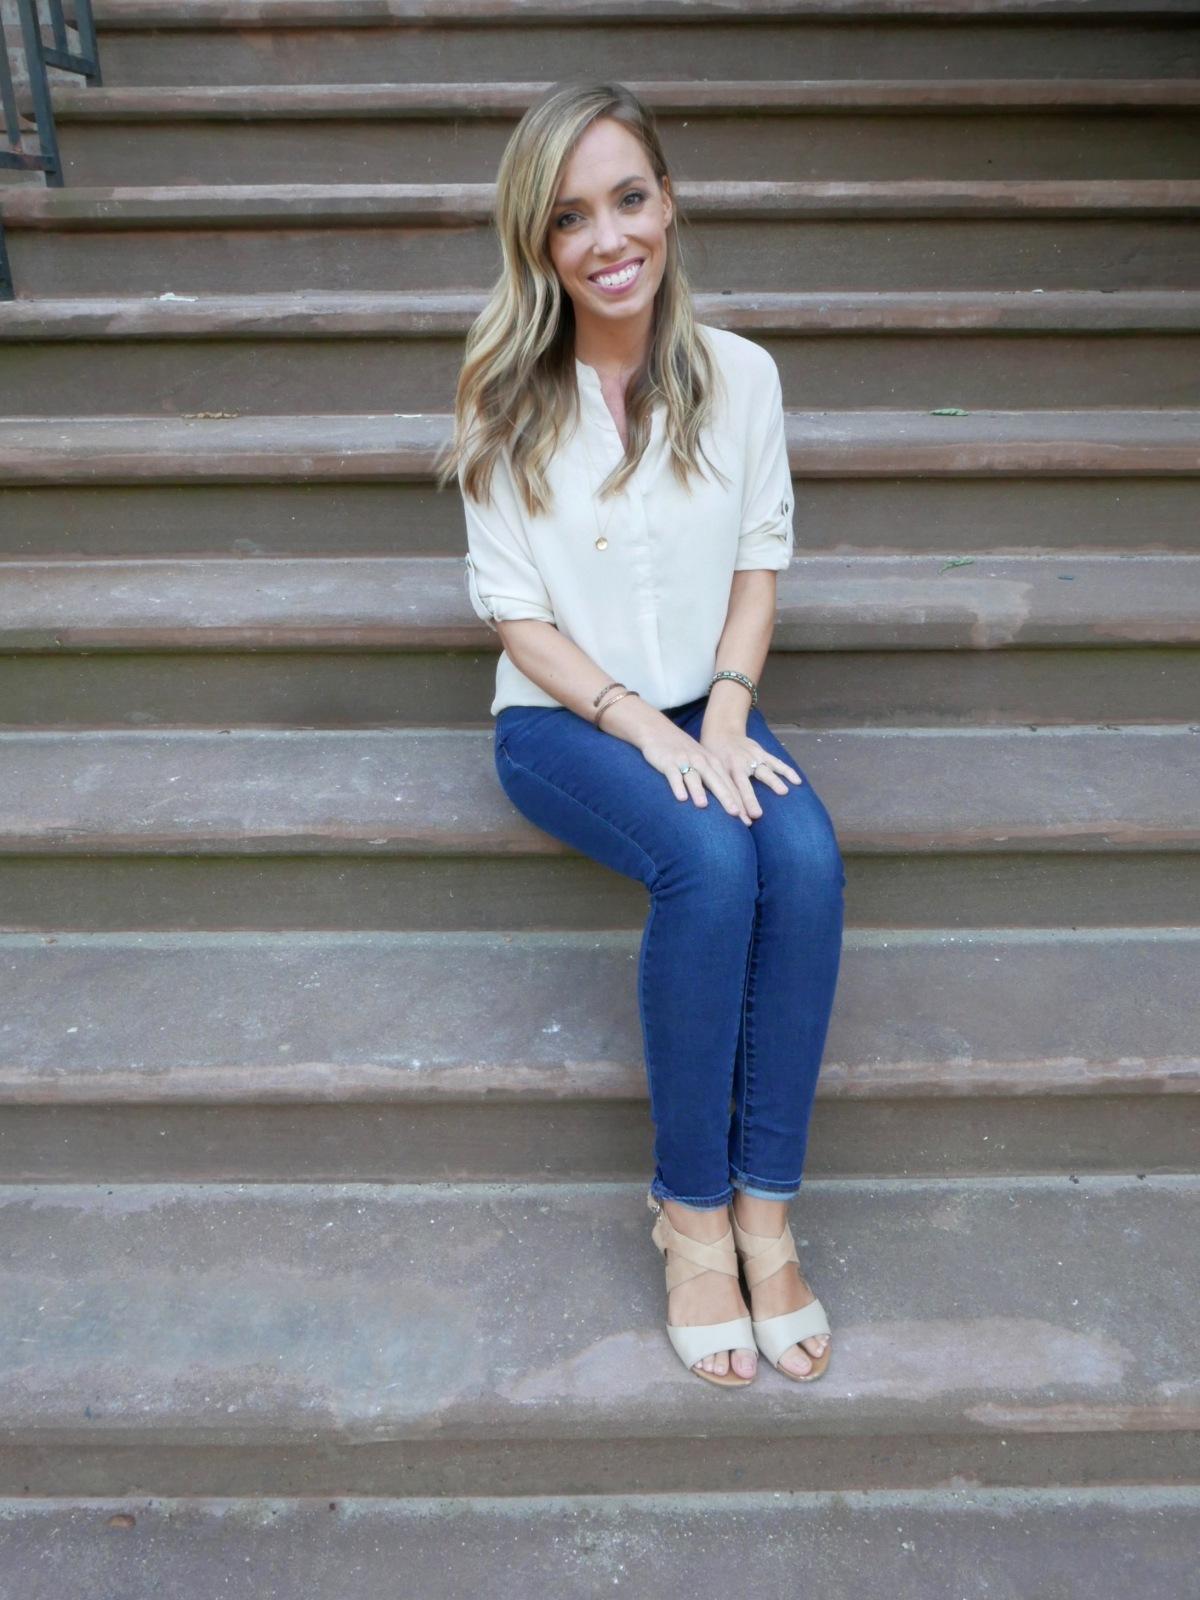 Caroline: Co-owner of Mental Health & Wellness PrivatePractice